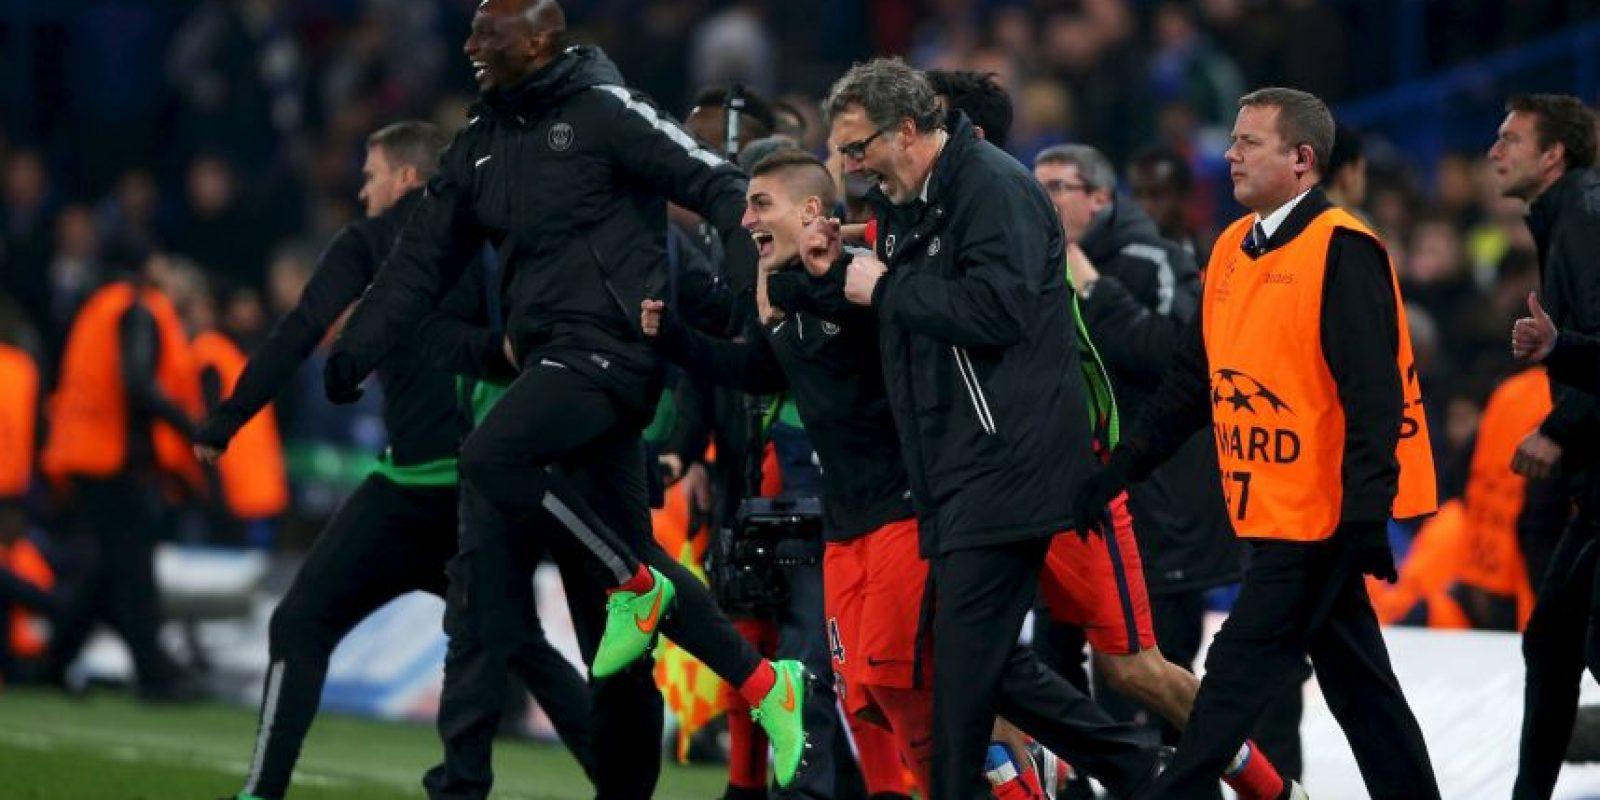 Así celebró Laurent Blanc el pase del PSG a cuartos de final Foto:Getty Images